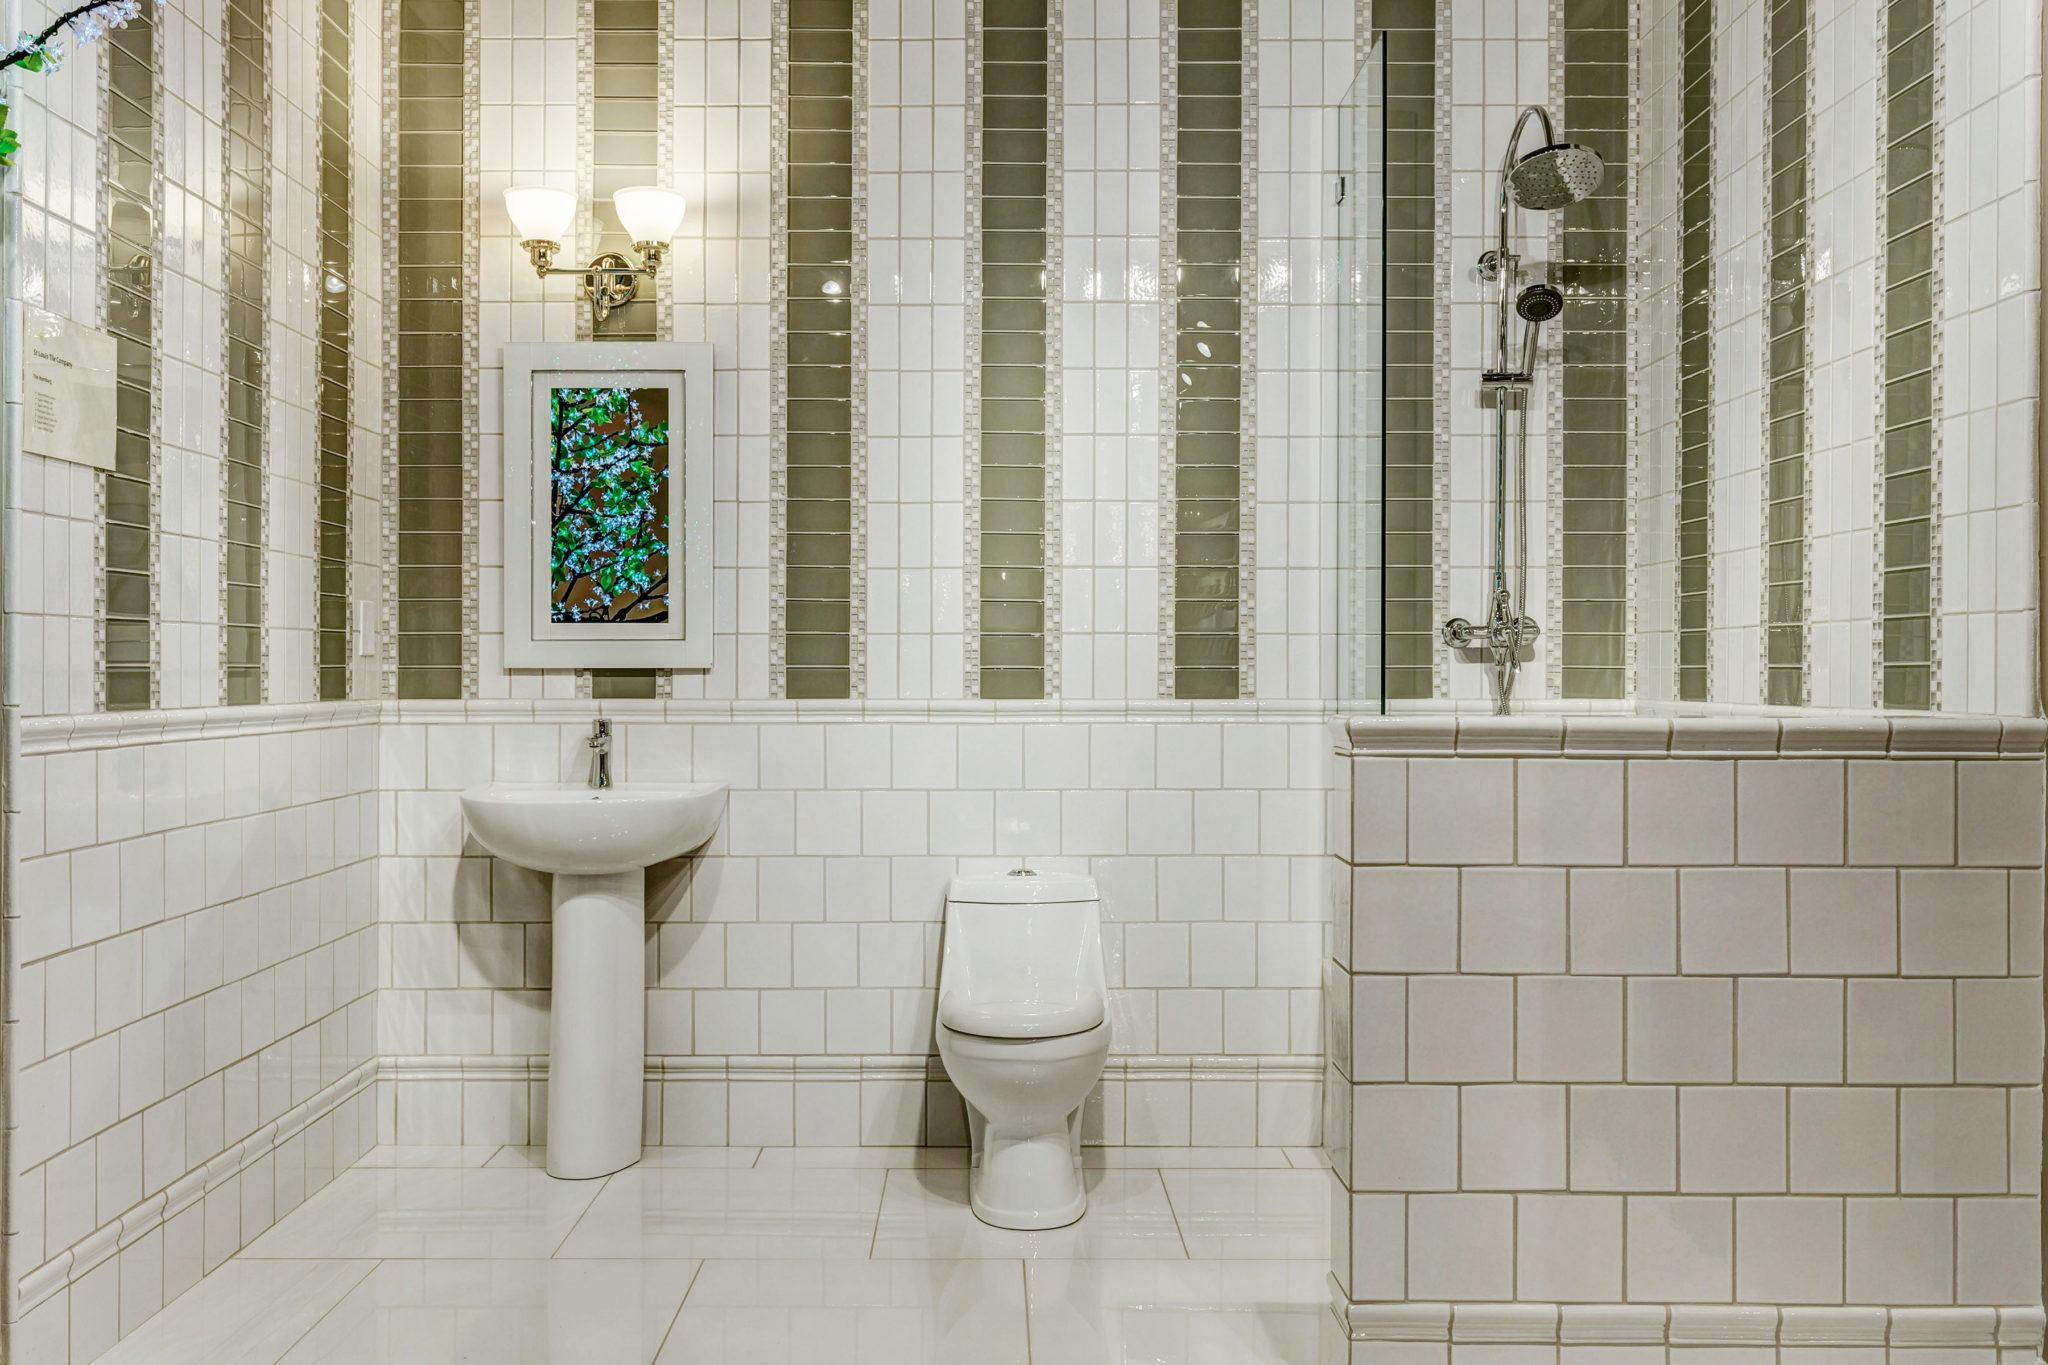 St. Louis Tile Showroom Ellisville 63021: Tile For Every Room